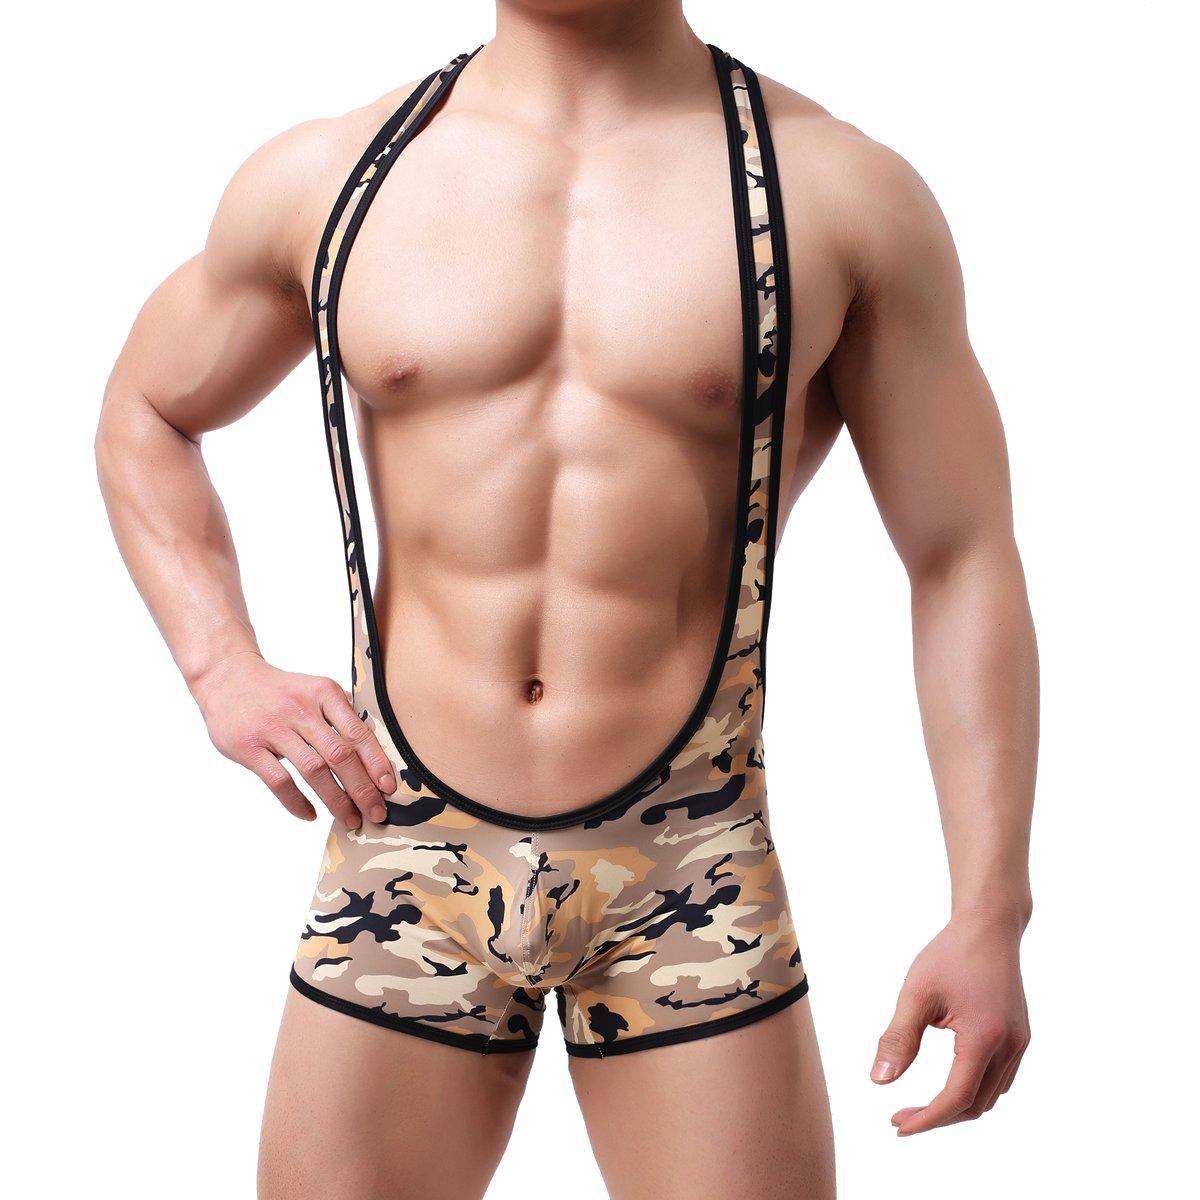 Sexy Men Bodysuit Jumpsuits Underwear Camo Wrestling Singlet Lingerie